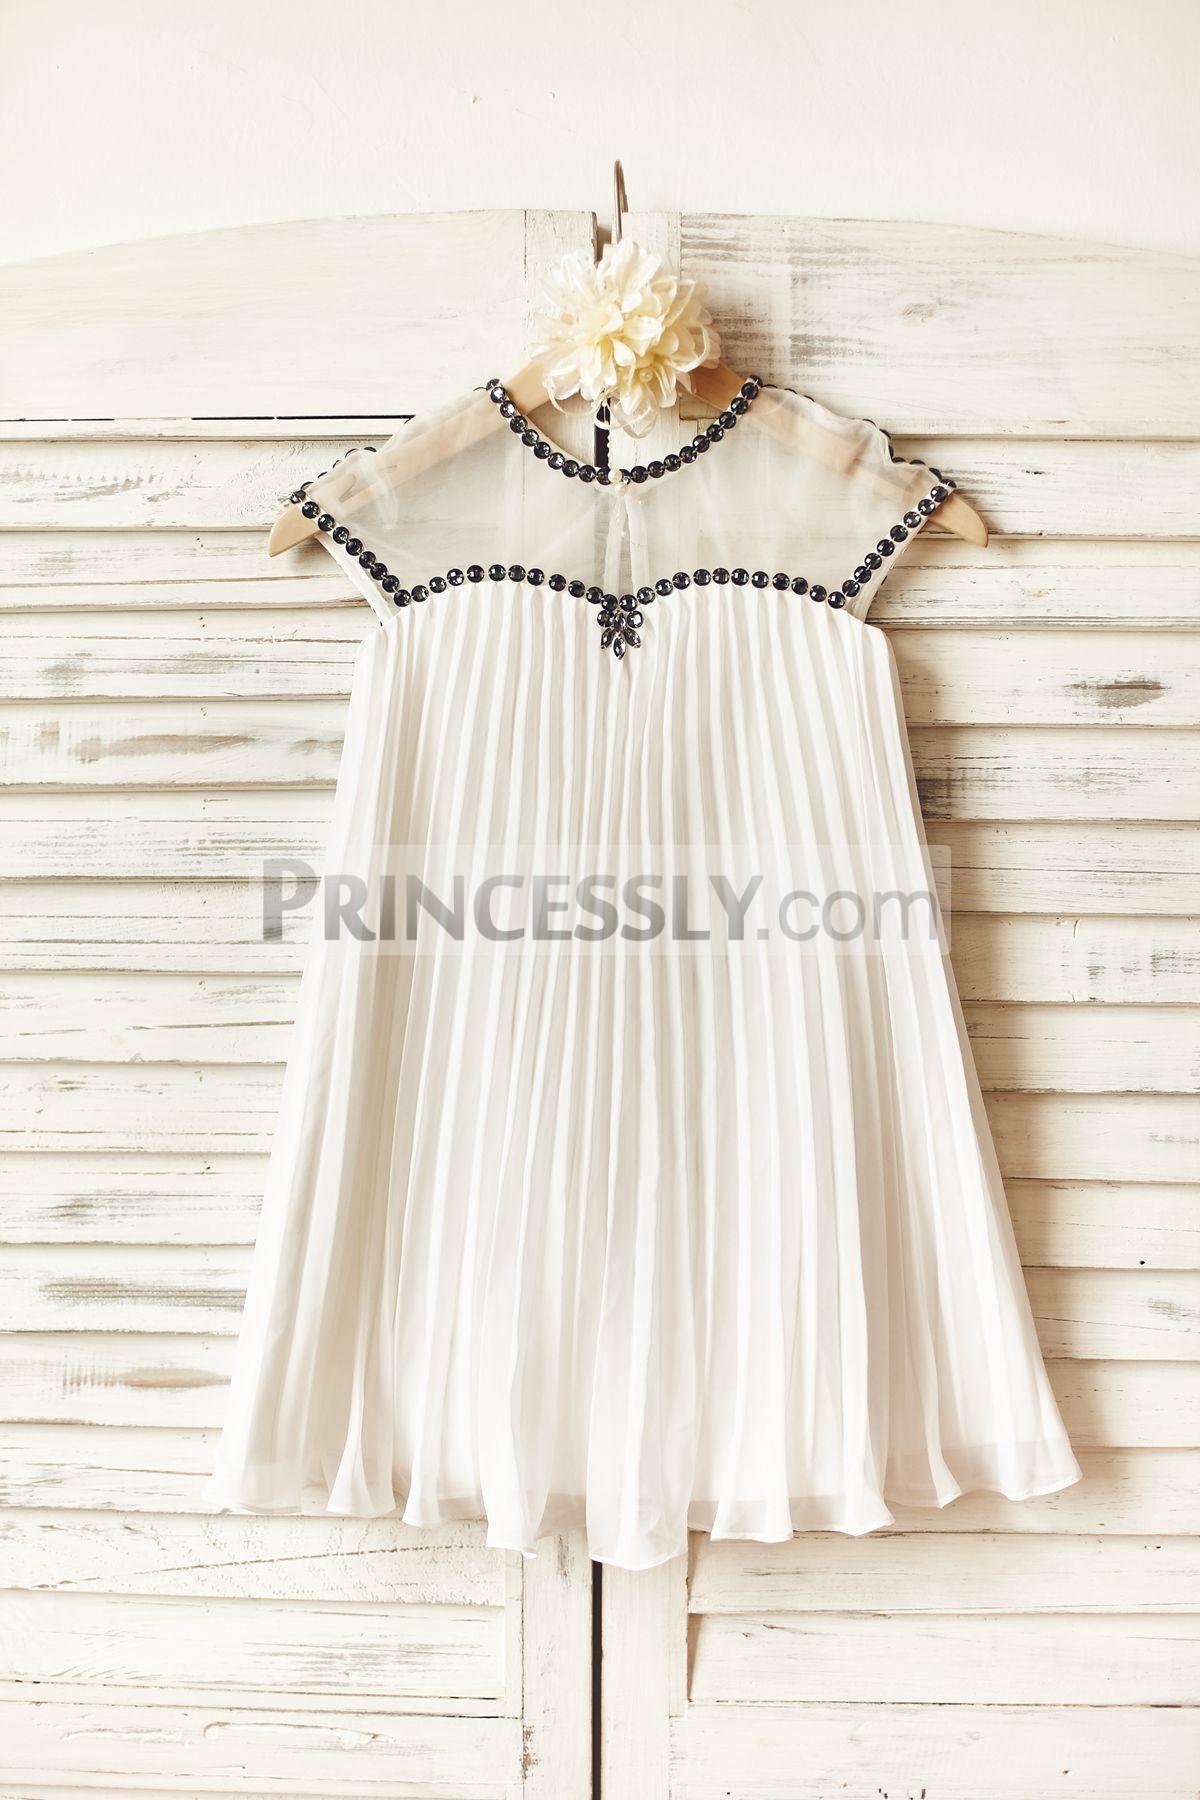 Princessly.com-K1000157-Sheer Neck Gray Beaded Ivory Chiffon Flower Girl Dress-31